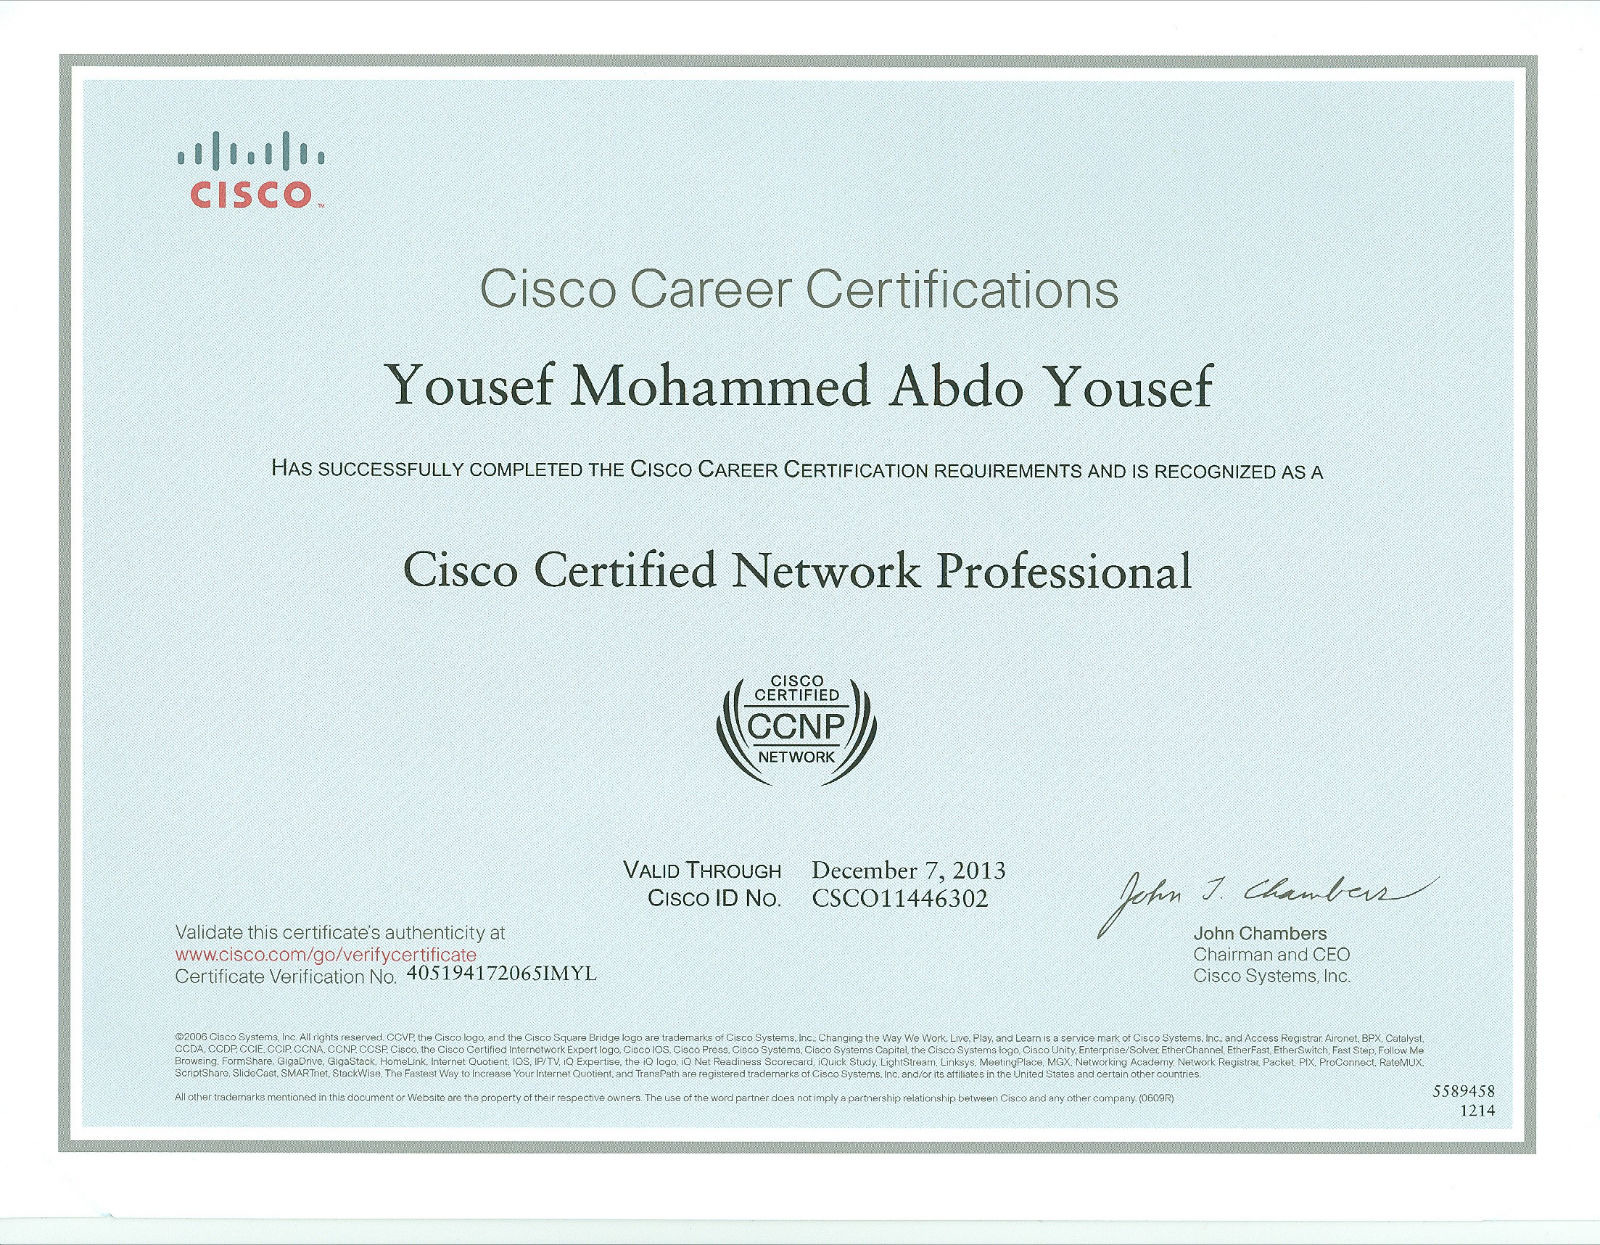 Yousefm yousef bayt cisco certified network professional ccnp certificate xflitez Gallery